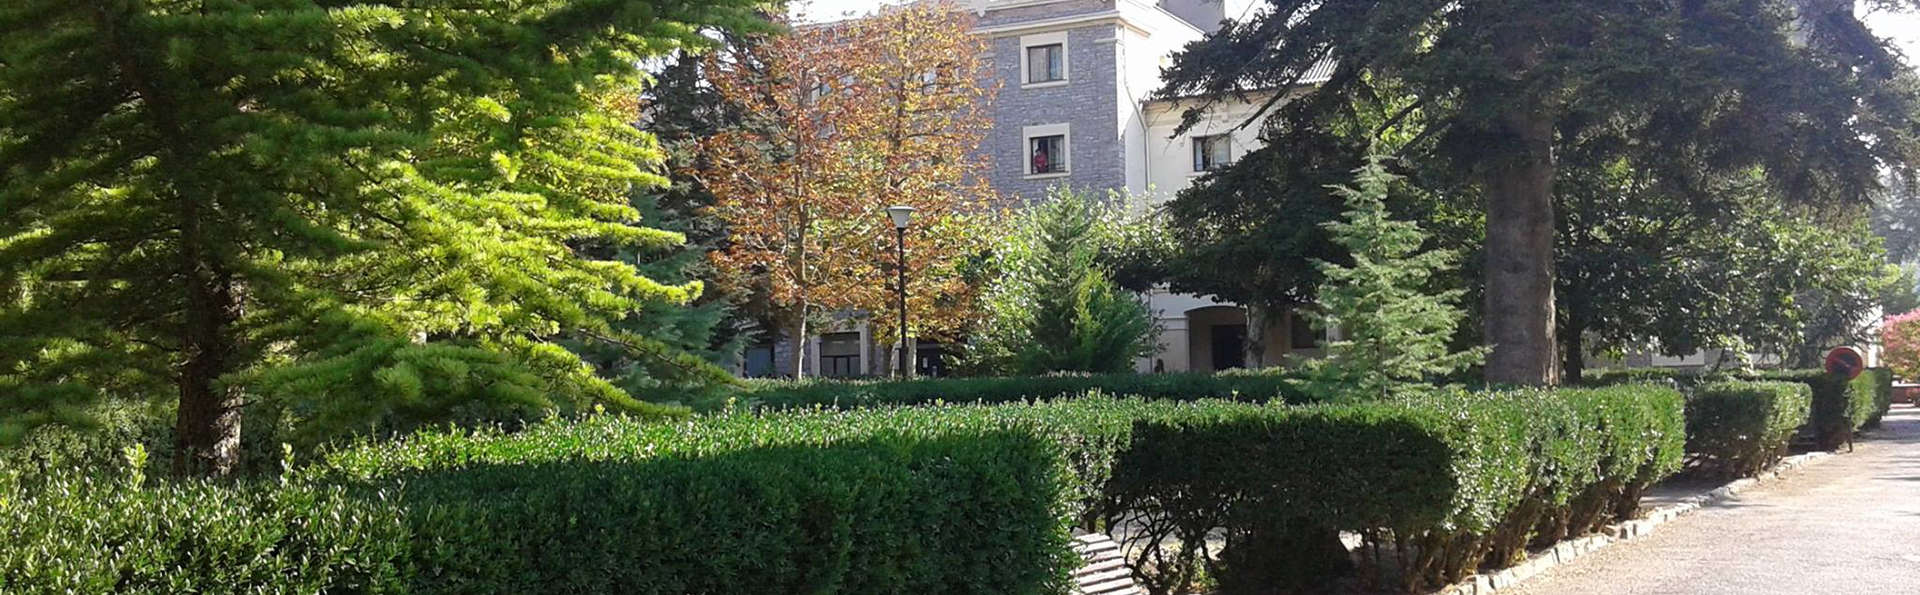 Hotel Balneari de Vallfogona de Riucorb - Edit_Garden2.jpg